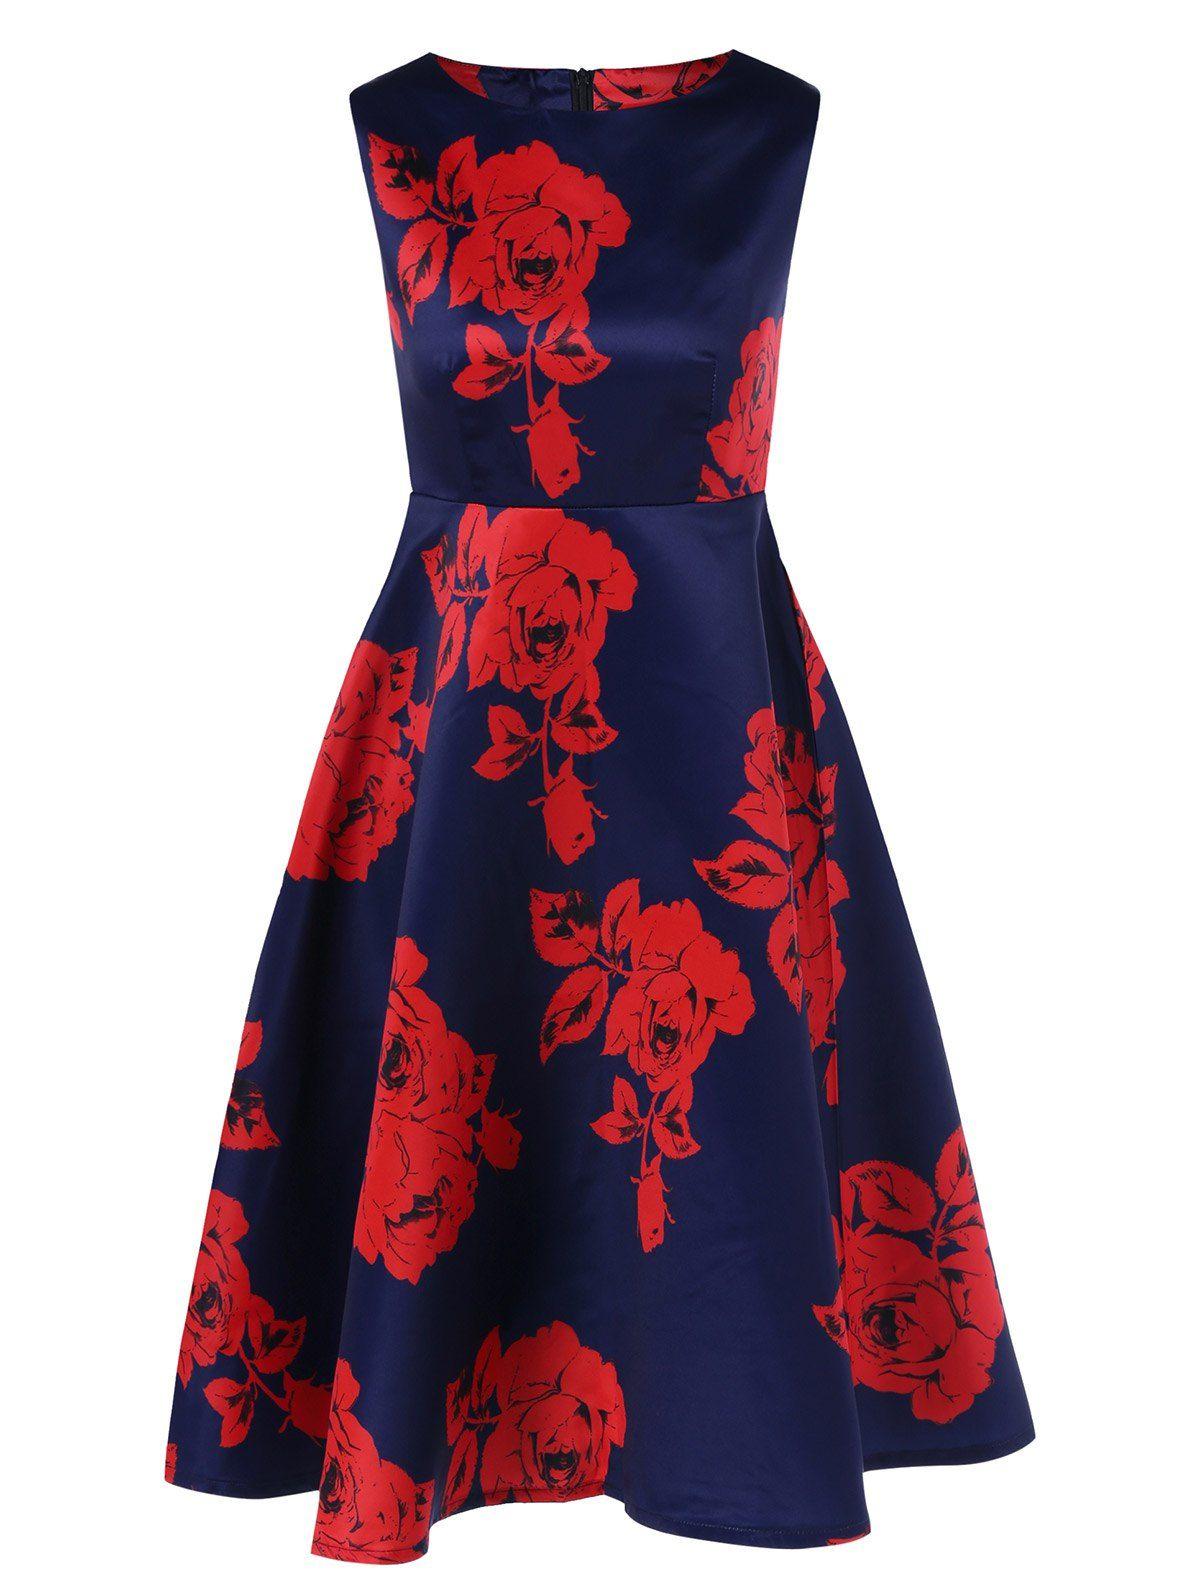 High Waist Floral Flare Dress in Red | Sammydress.com